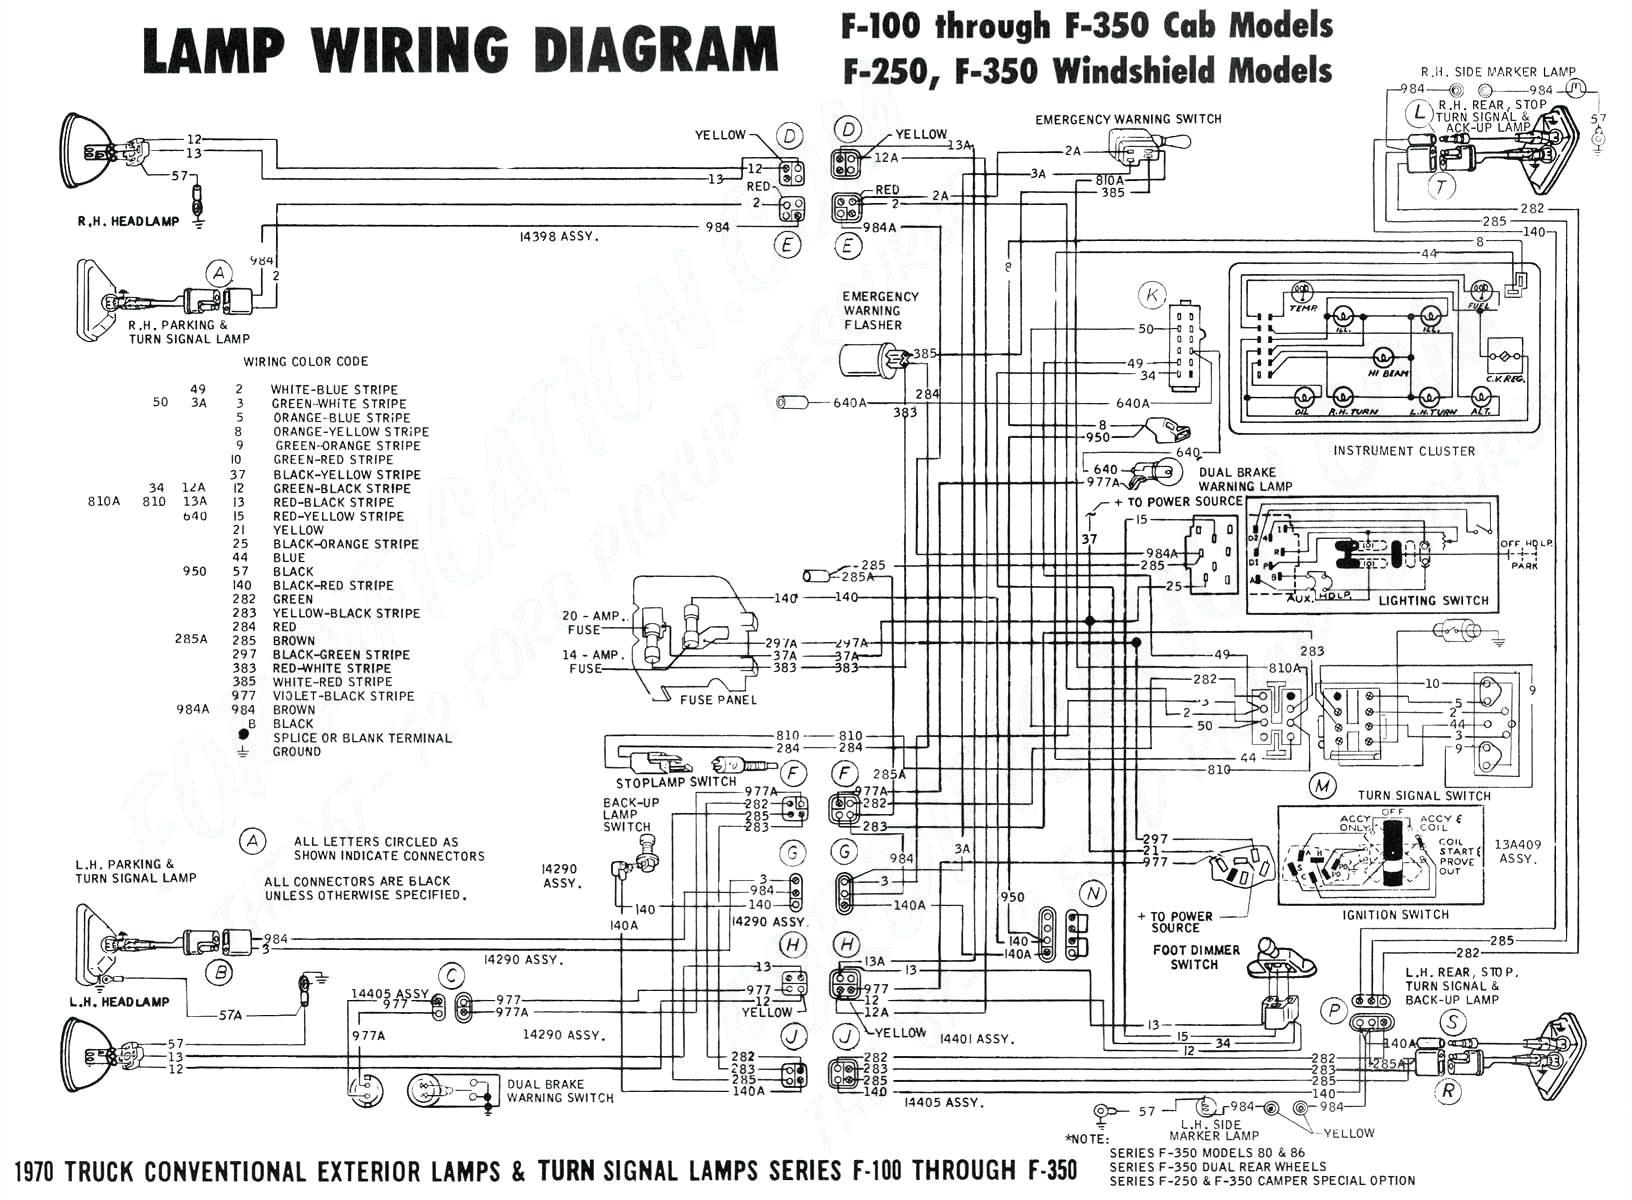 2001 Honda Accord Radio Wiring Diagram Honda Accord Radio Wiring Diagram Wiring Diagram Technic